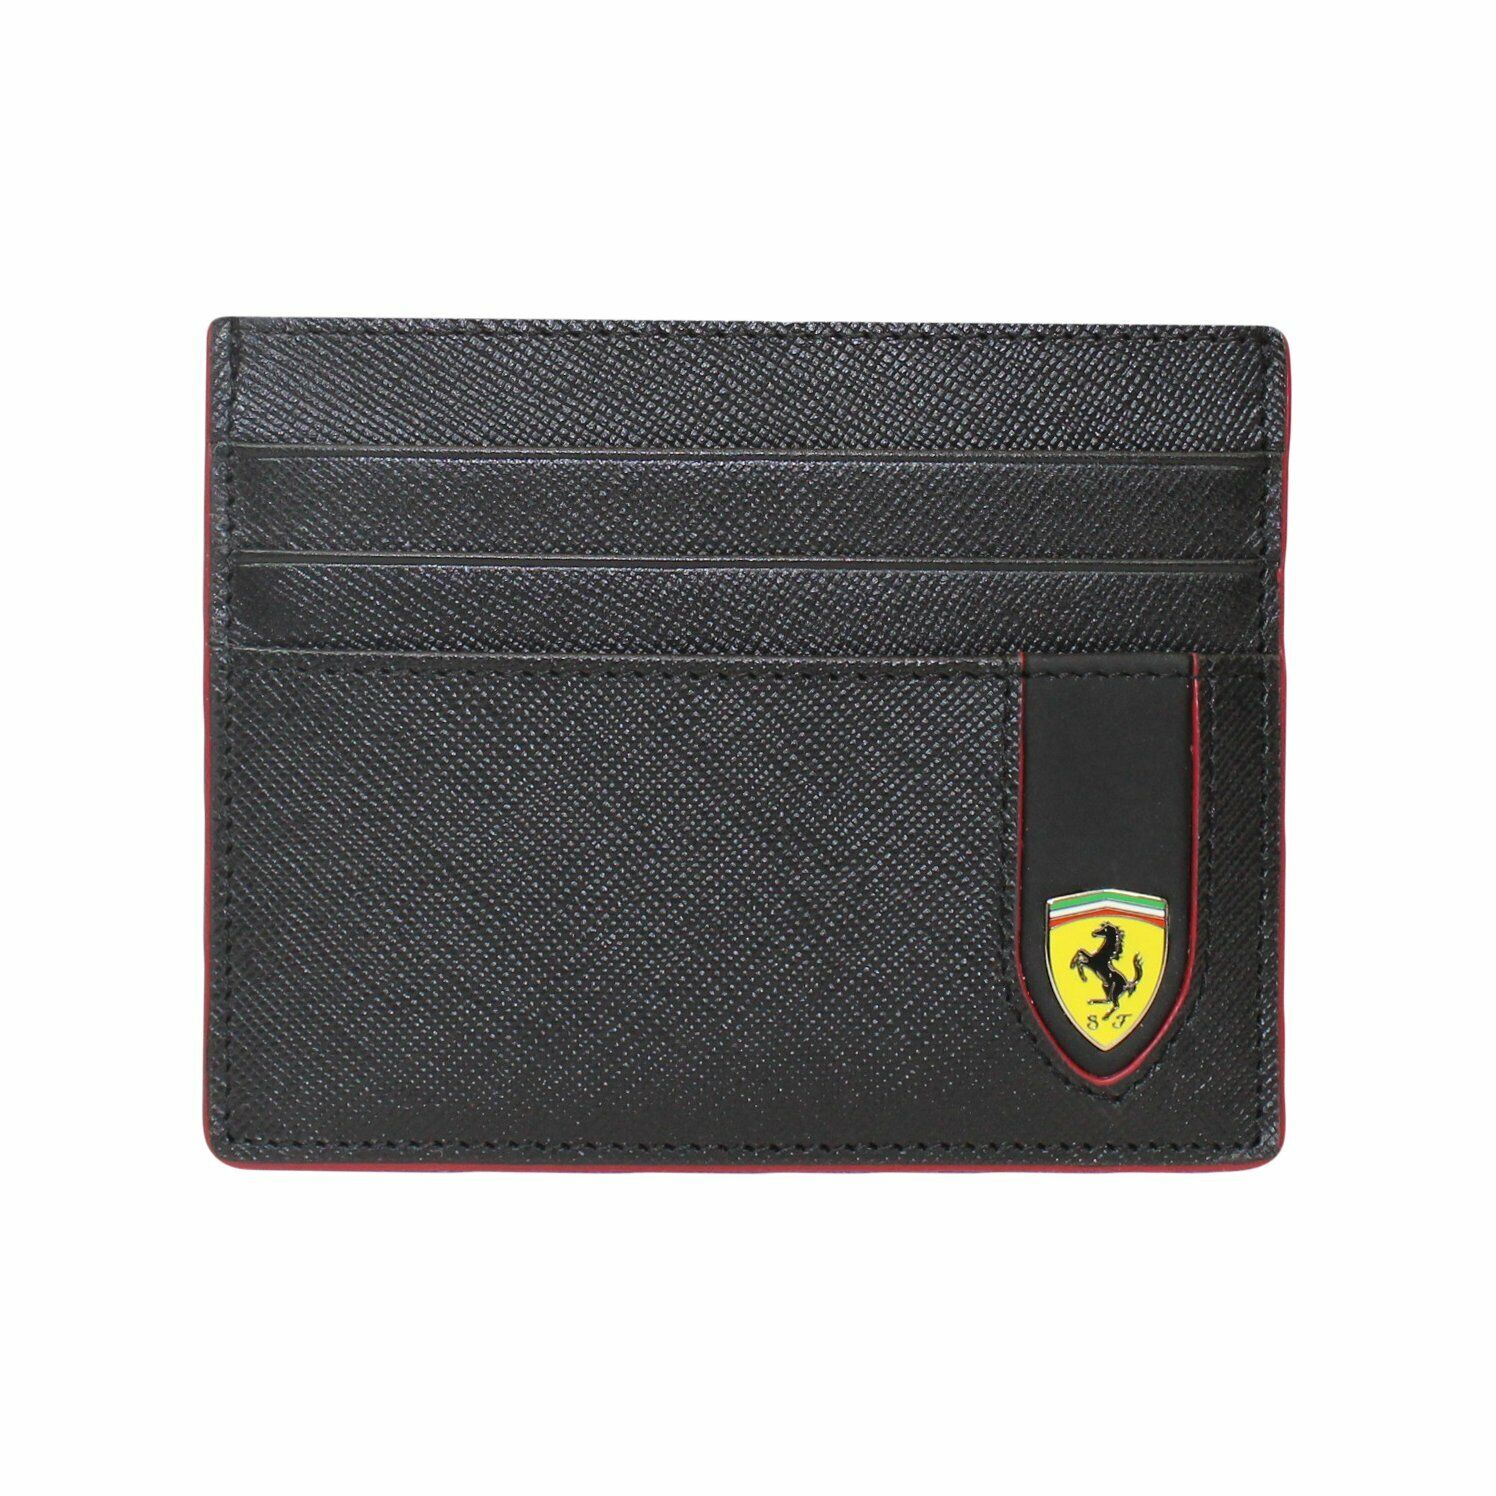 Evo Saffiano Leather Credit Card Holder